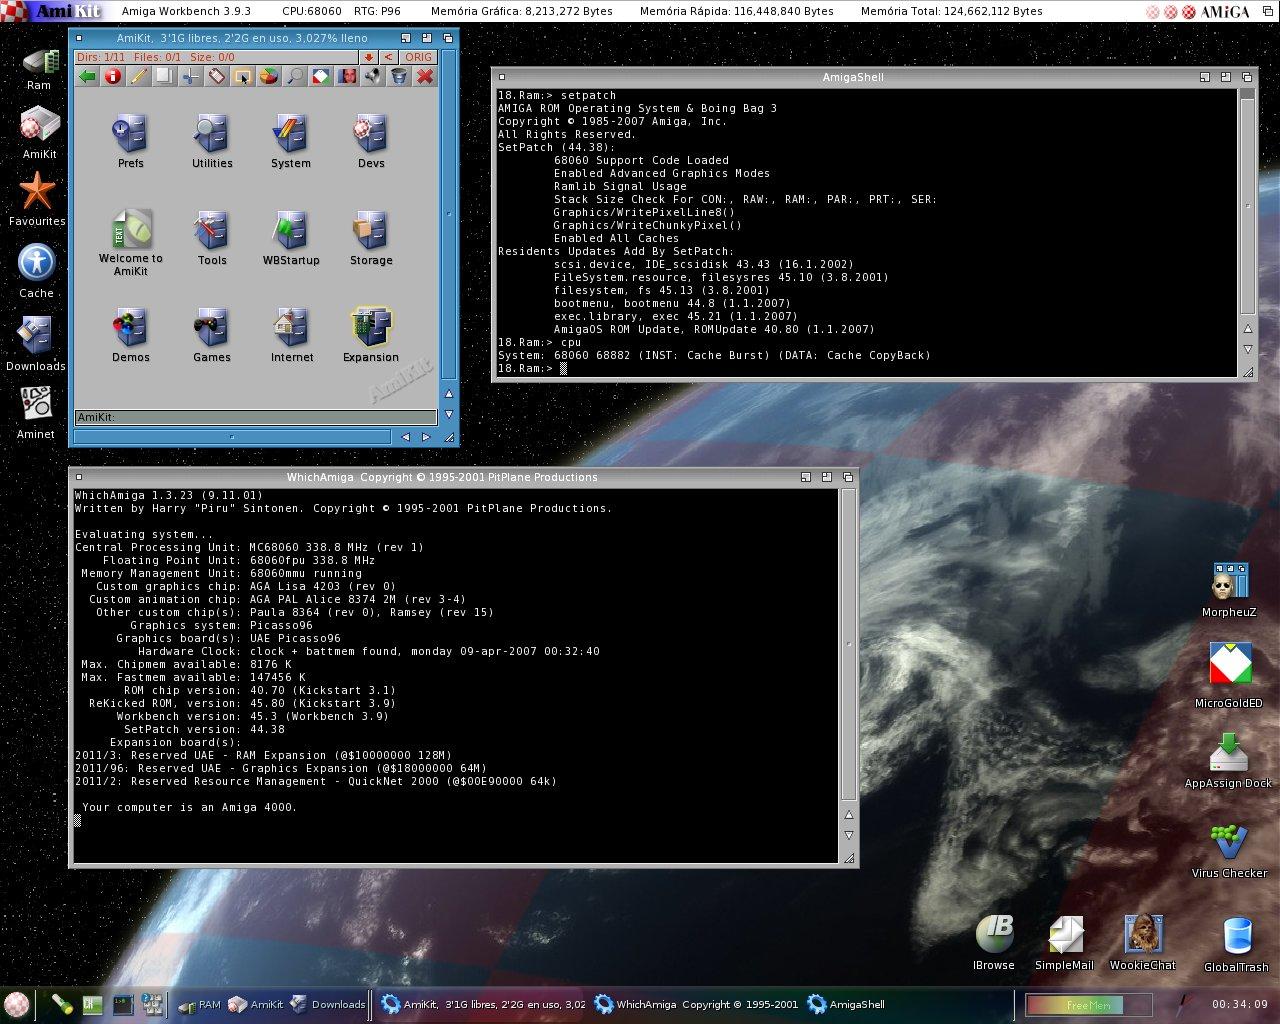 Amikit with Winaue emulating 68060